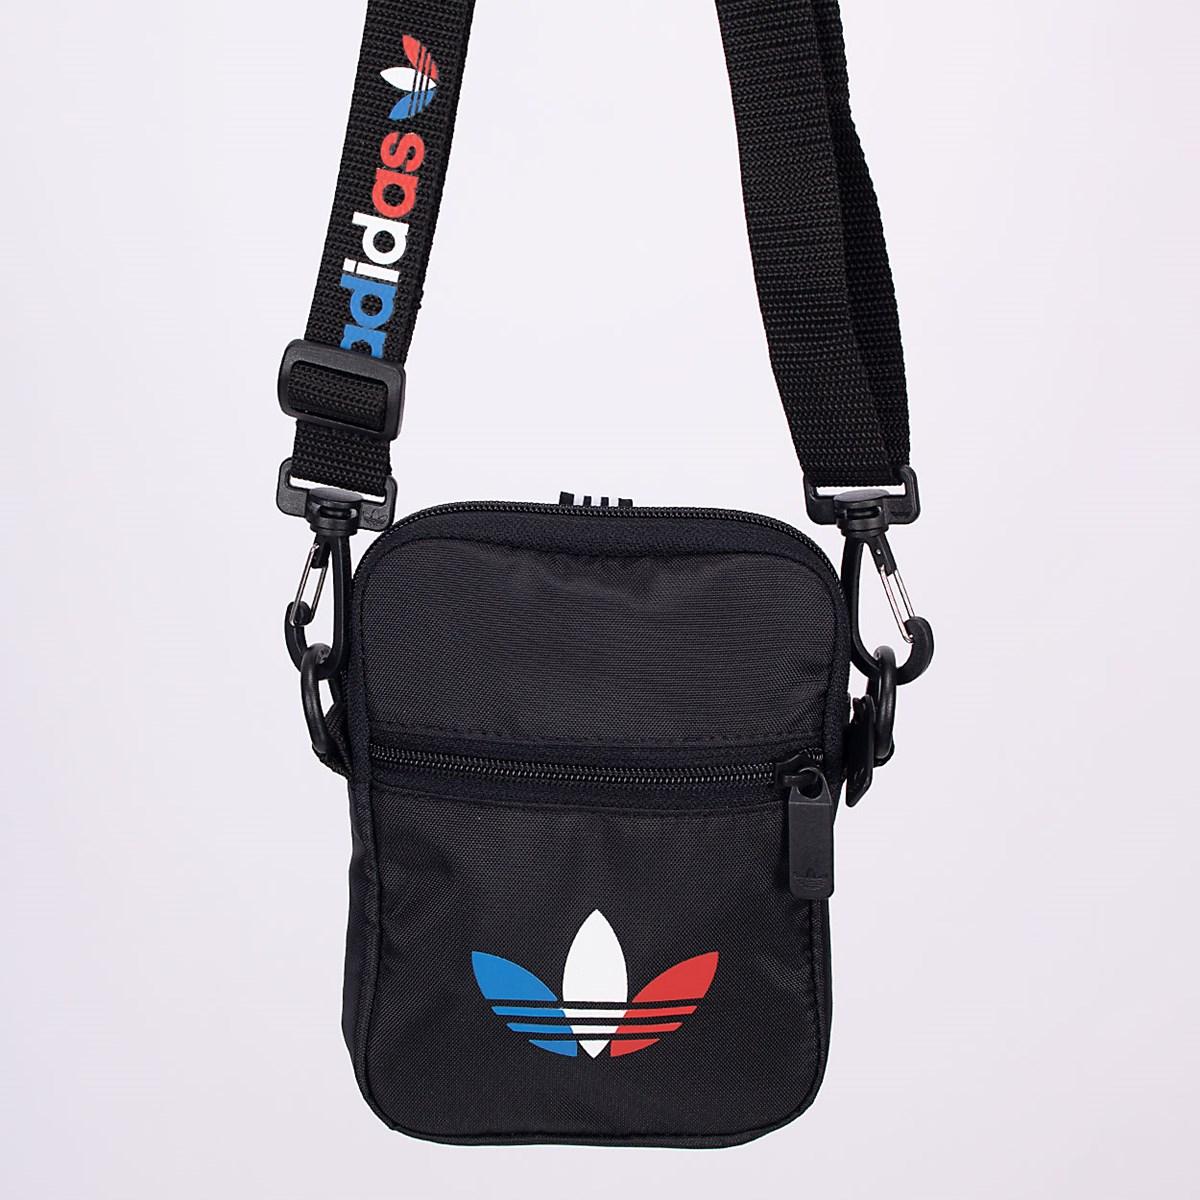 Bolsa adidas Festival Adicolor Tricolor Black GN5463